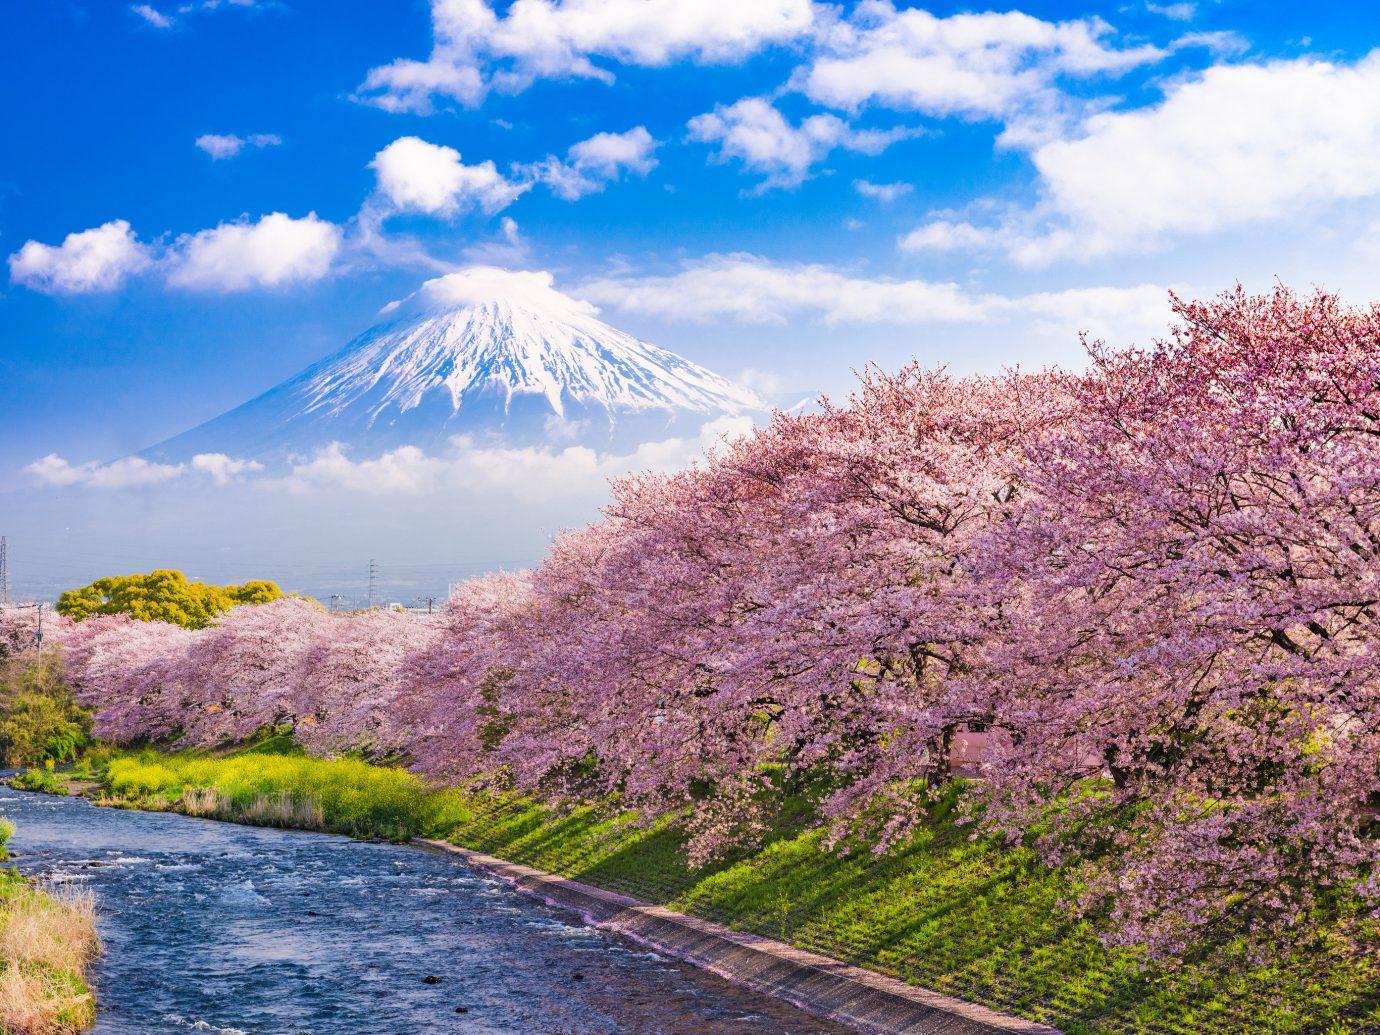 Japan Trip Ideas flower sky plant cherry blossom tree blossom spring mountain cloud mount scenery landscape national park computer wallpaper